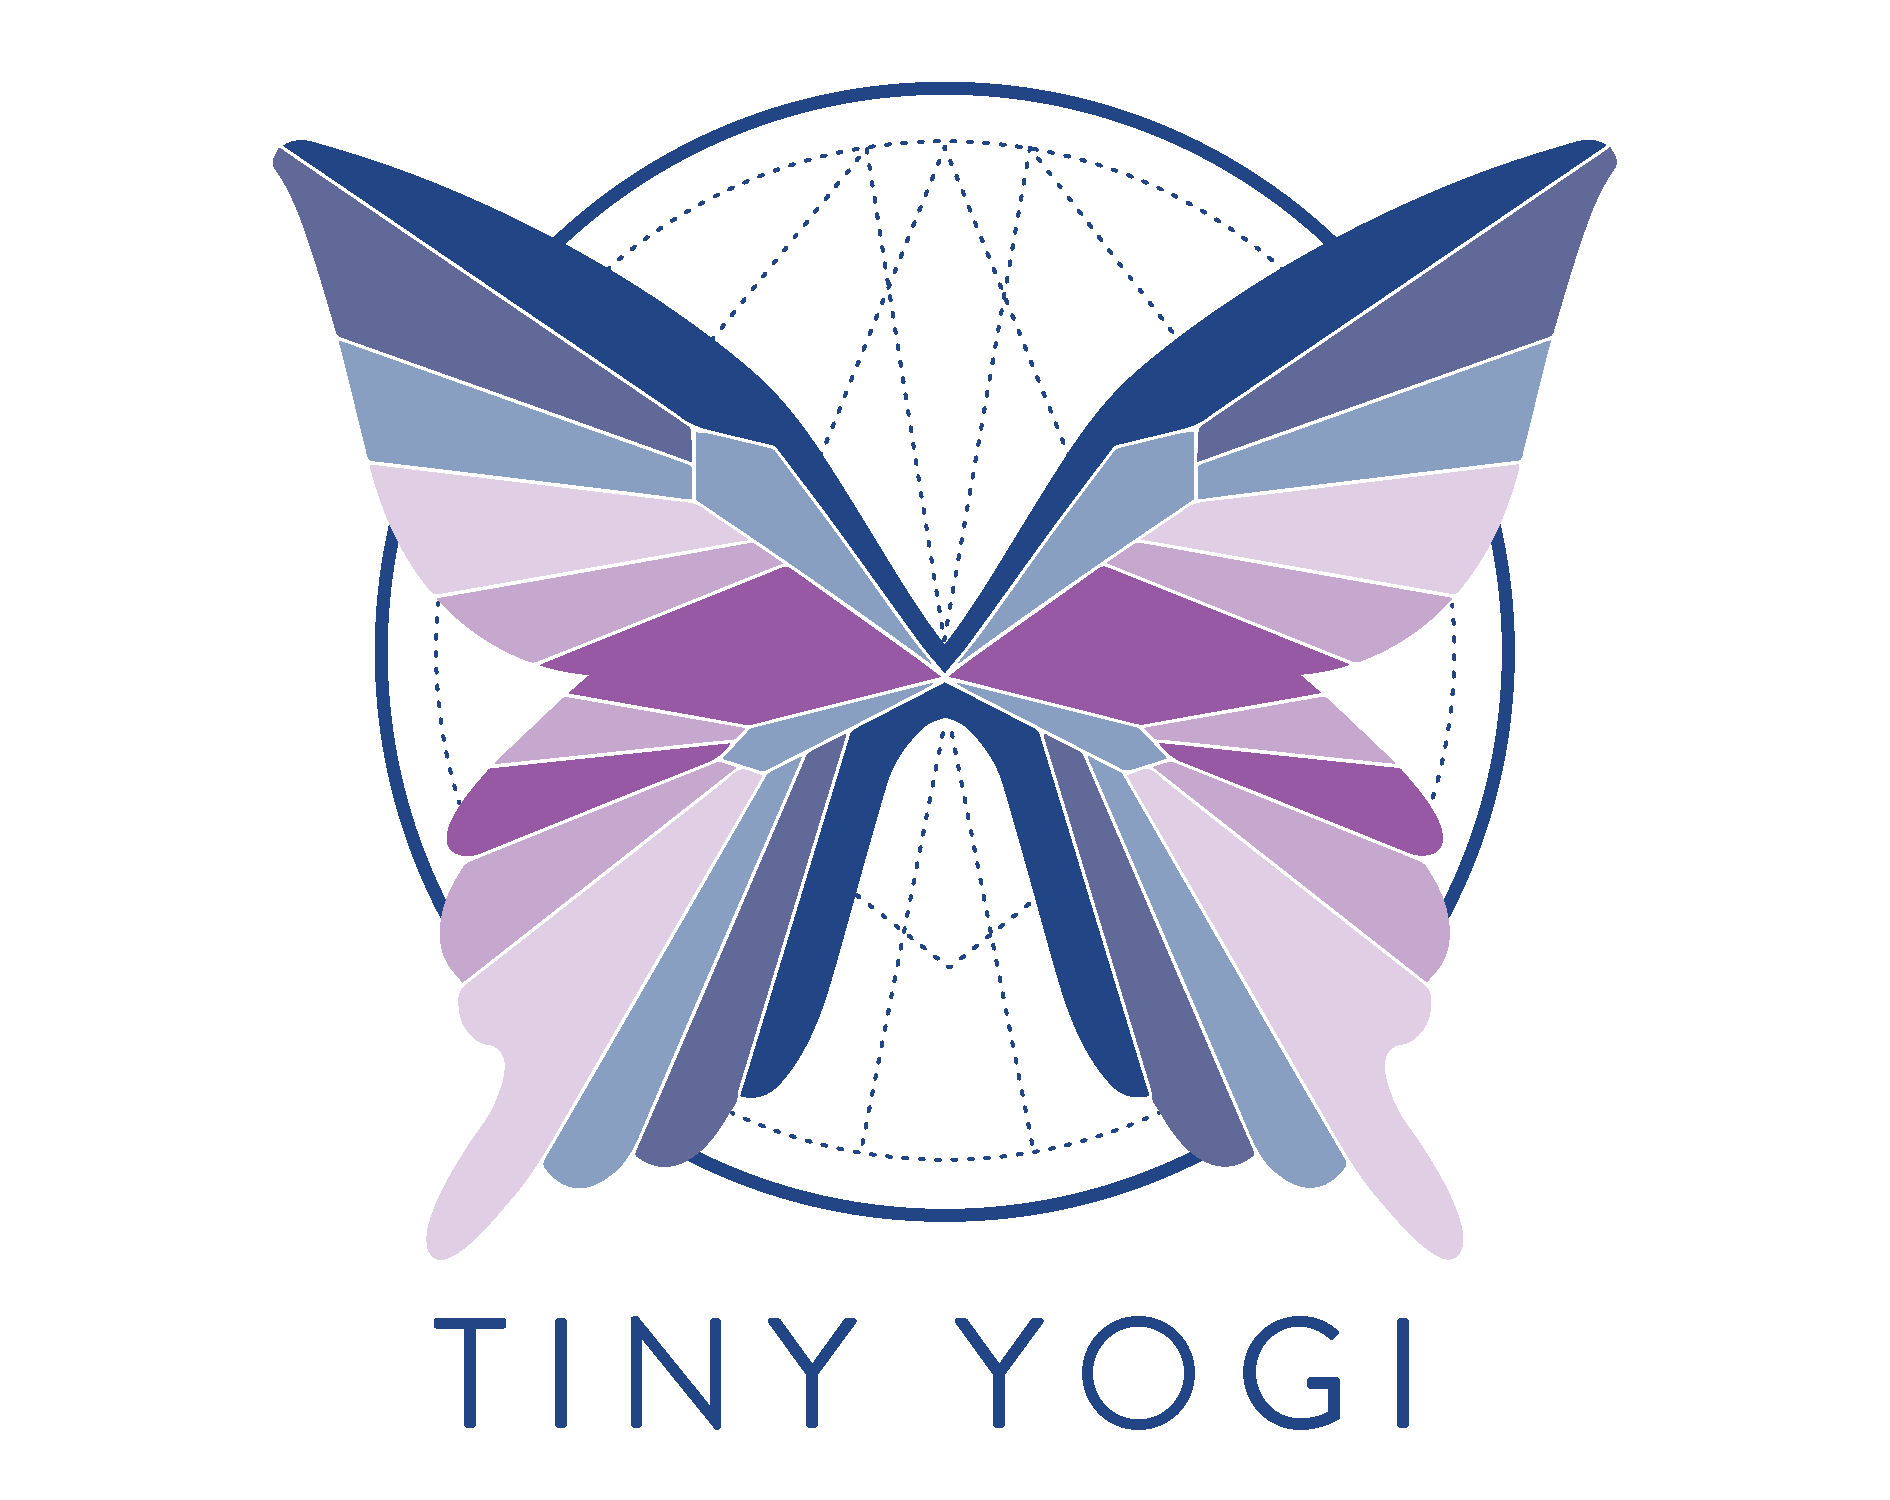 Tiny Yogi logo copy.png